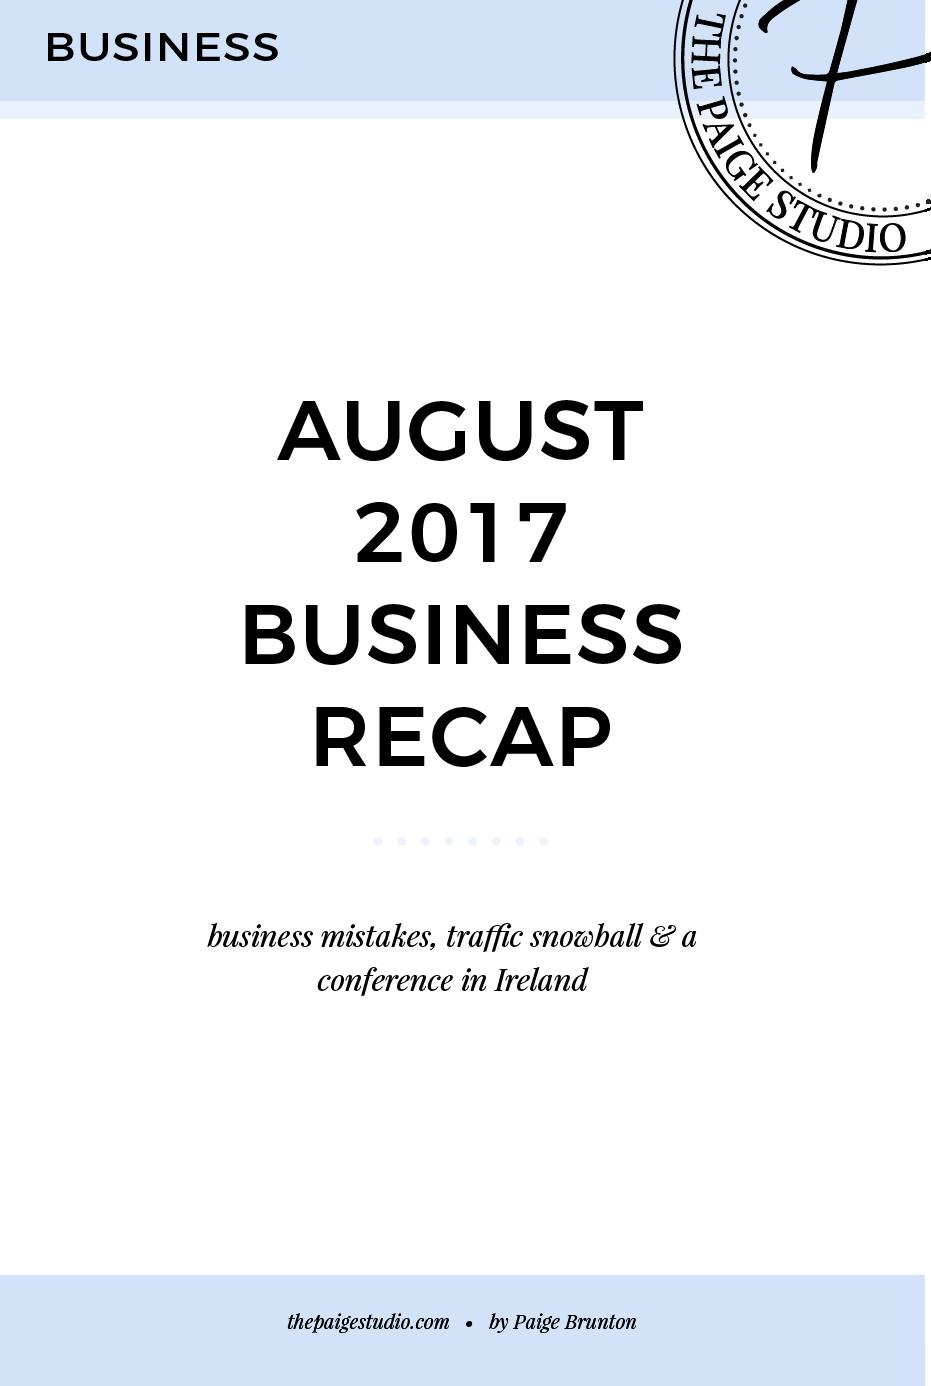 August 2017 business recap.png